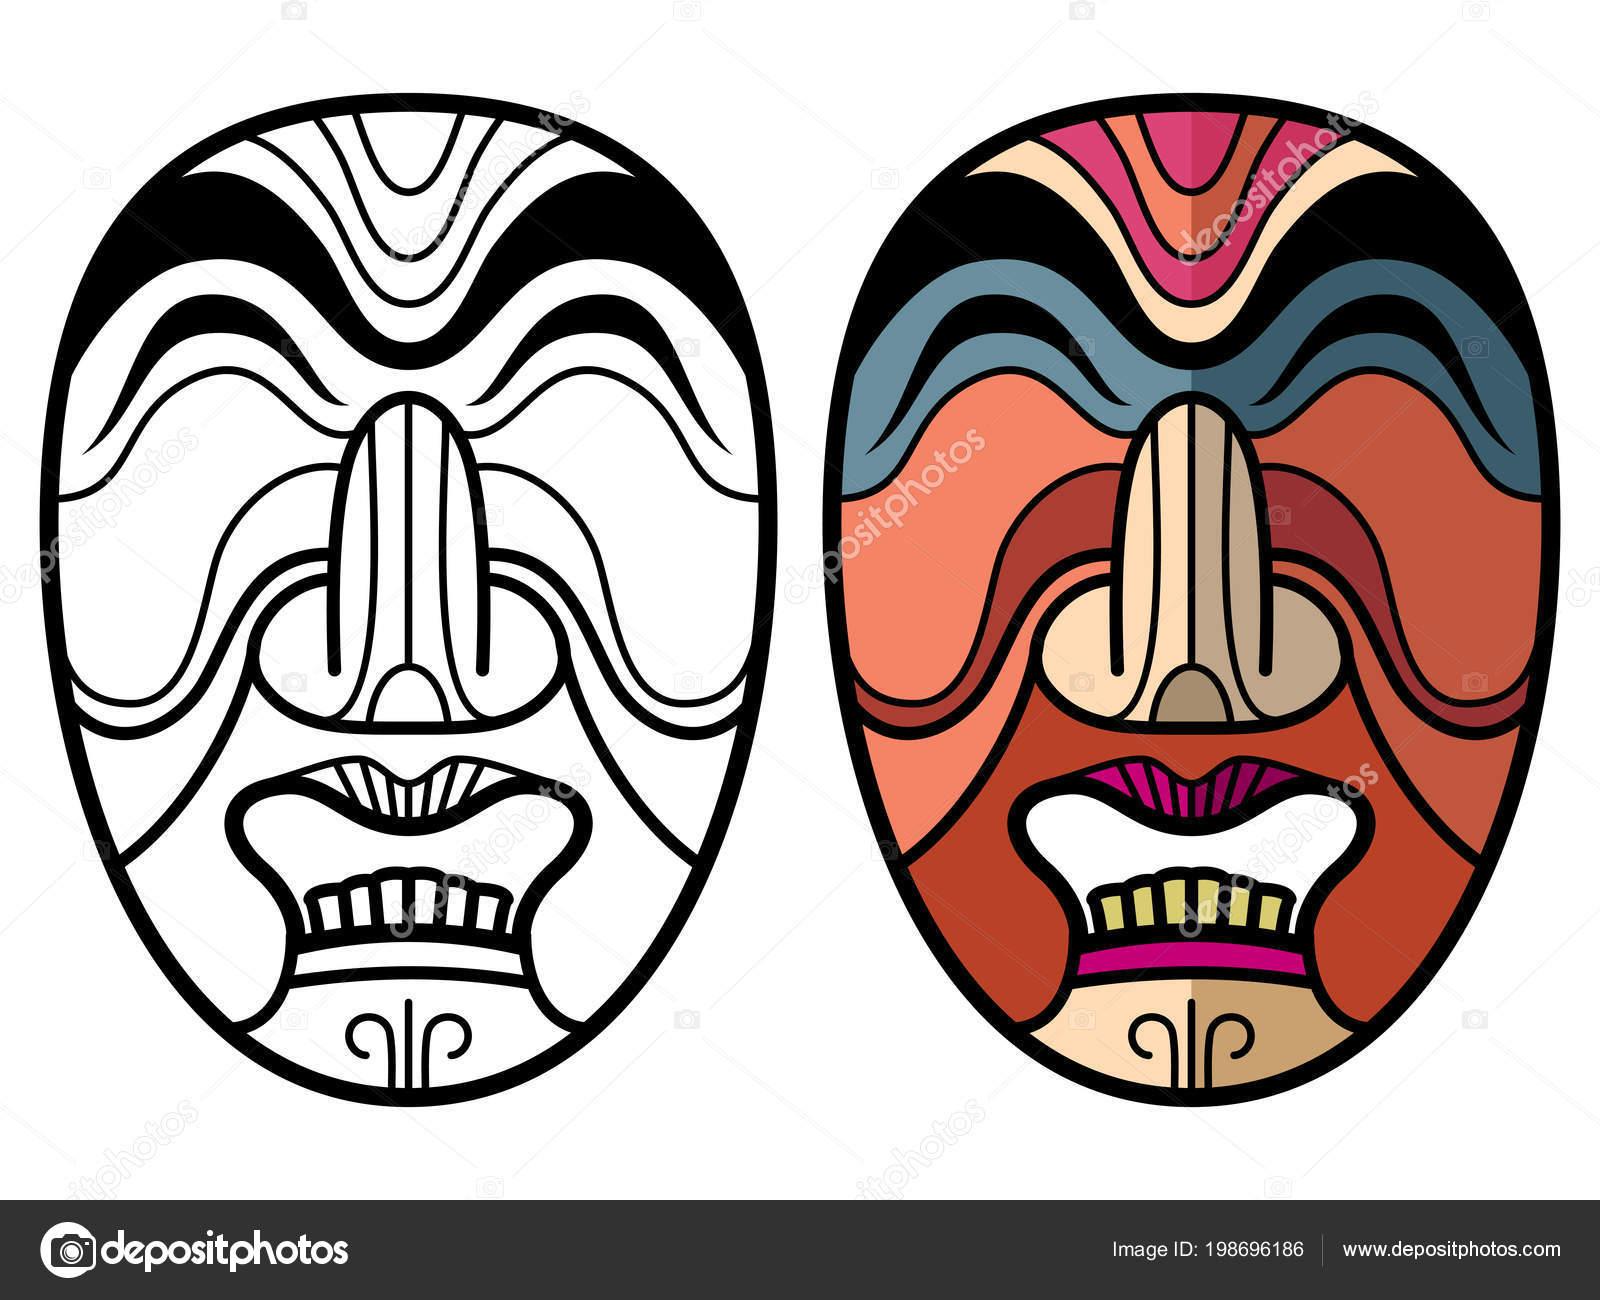 Meksika Hint Aztek Geleneksel Maskeleri Stok Vektör Microone